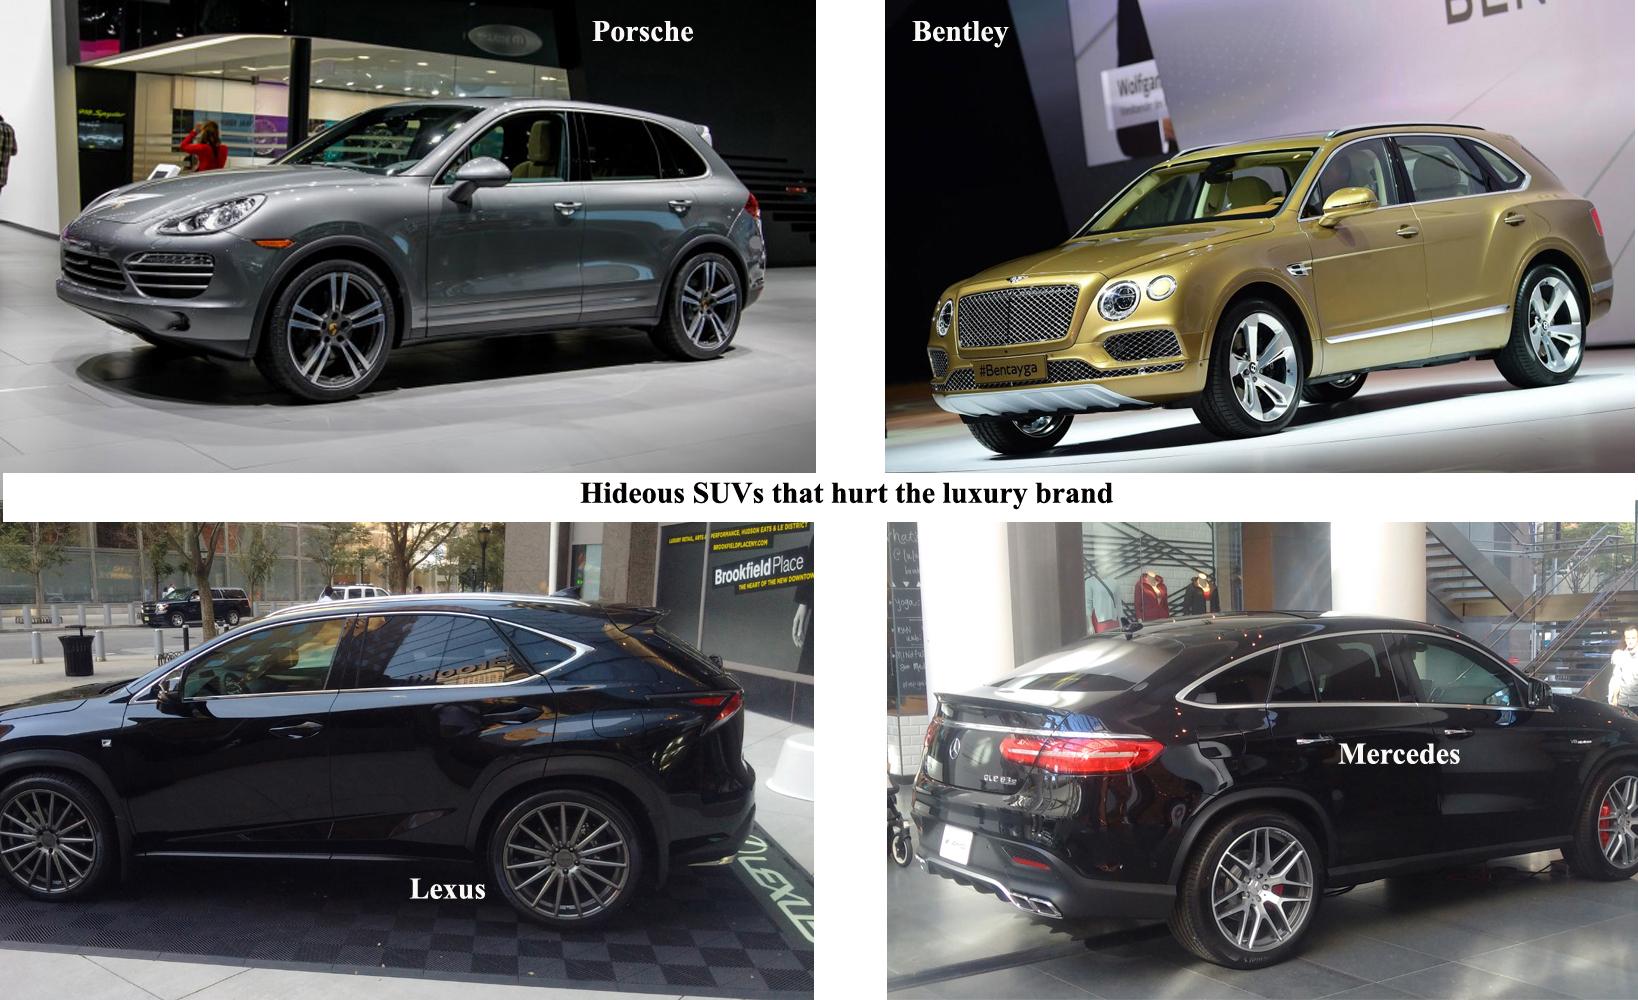 Ugly luxury SUV